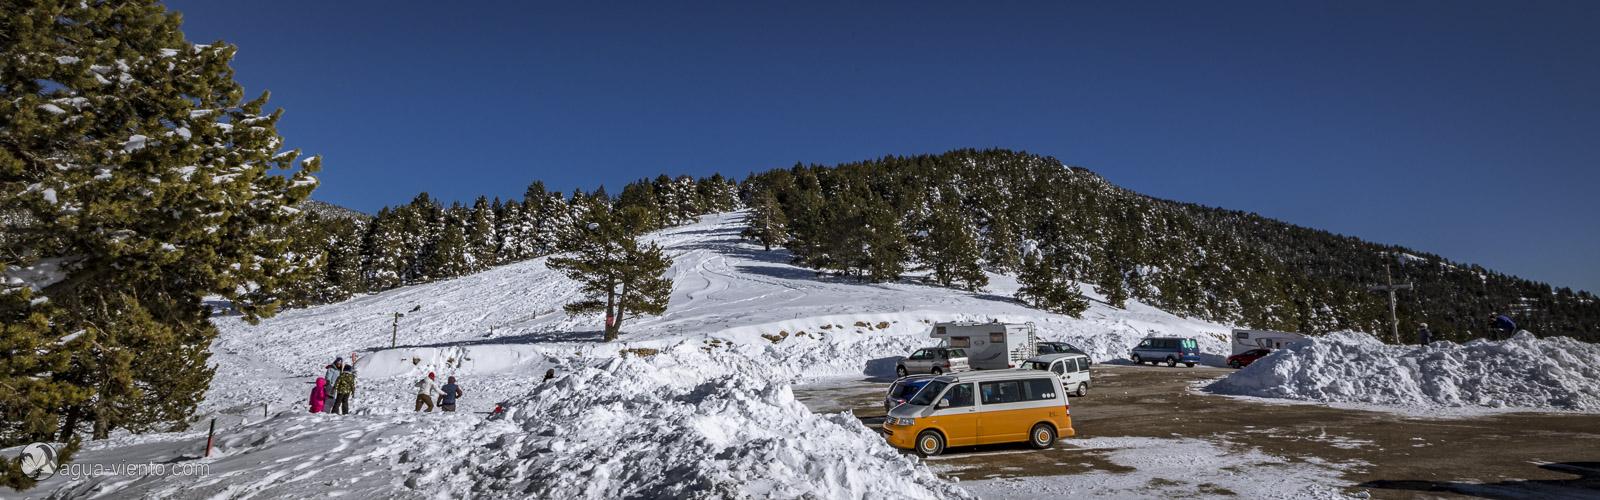 foto from Rasos de Peguera - Ski area in Bergueda in Catalonia